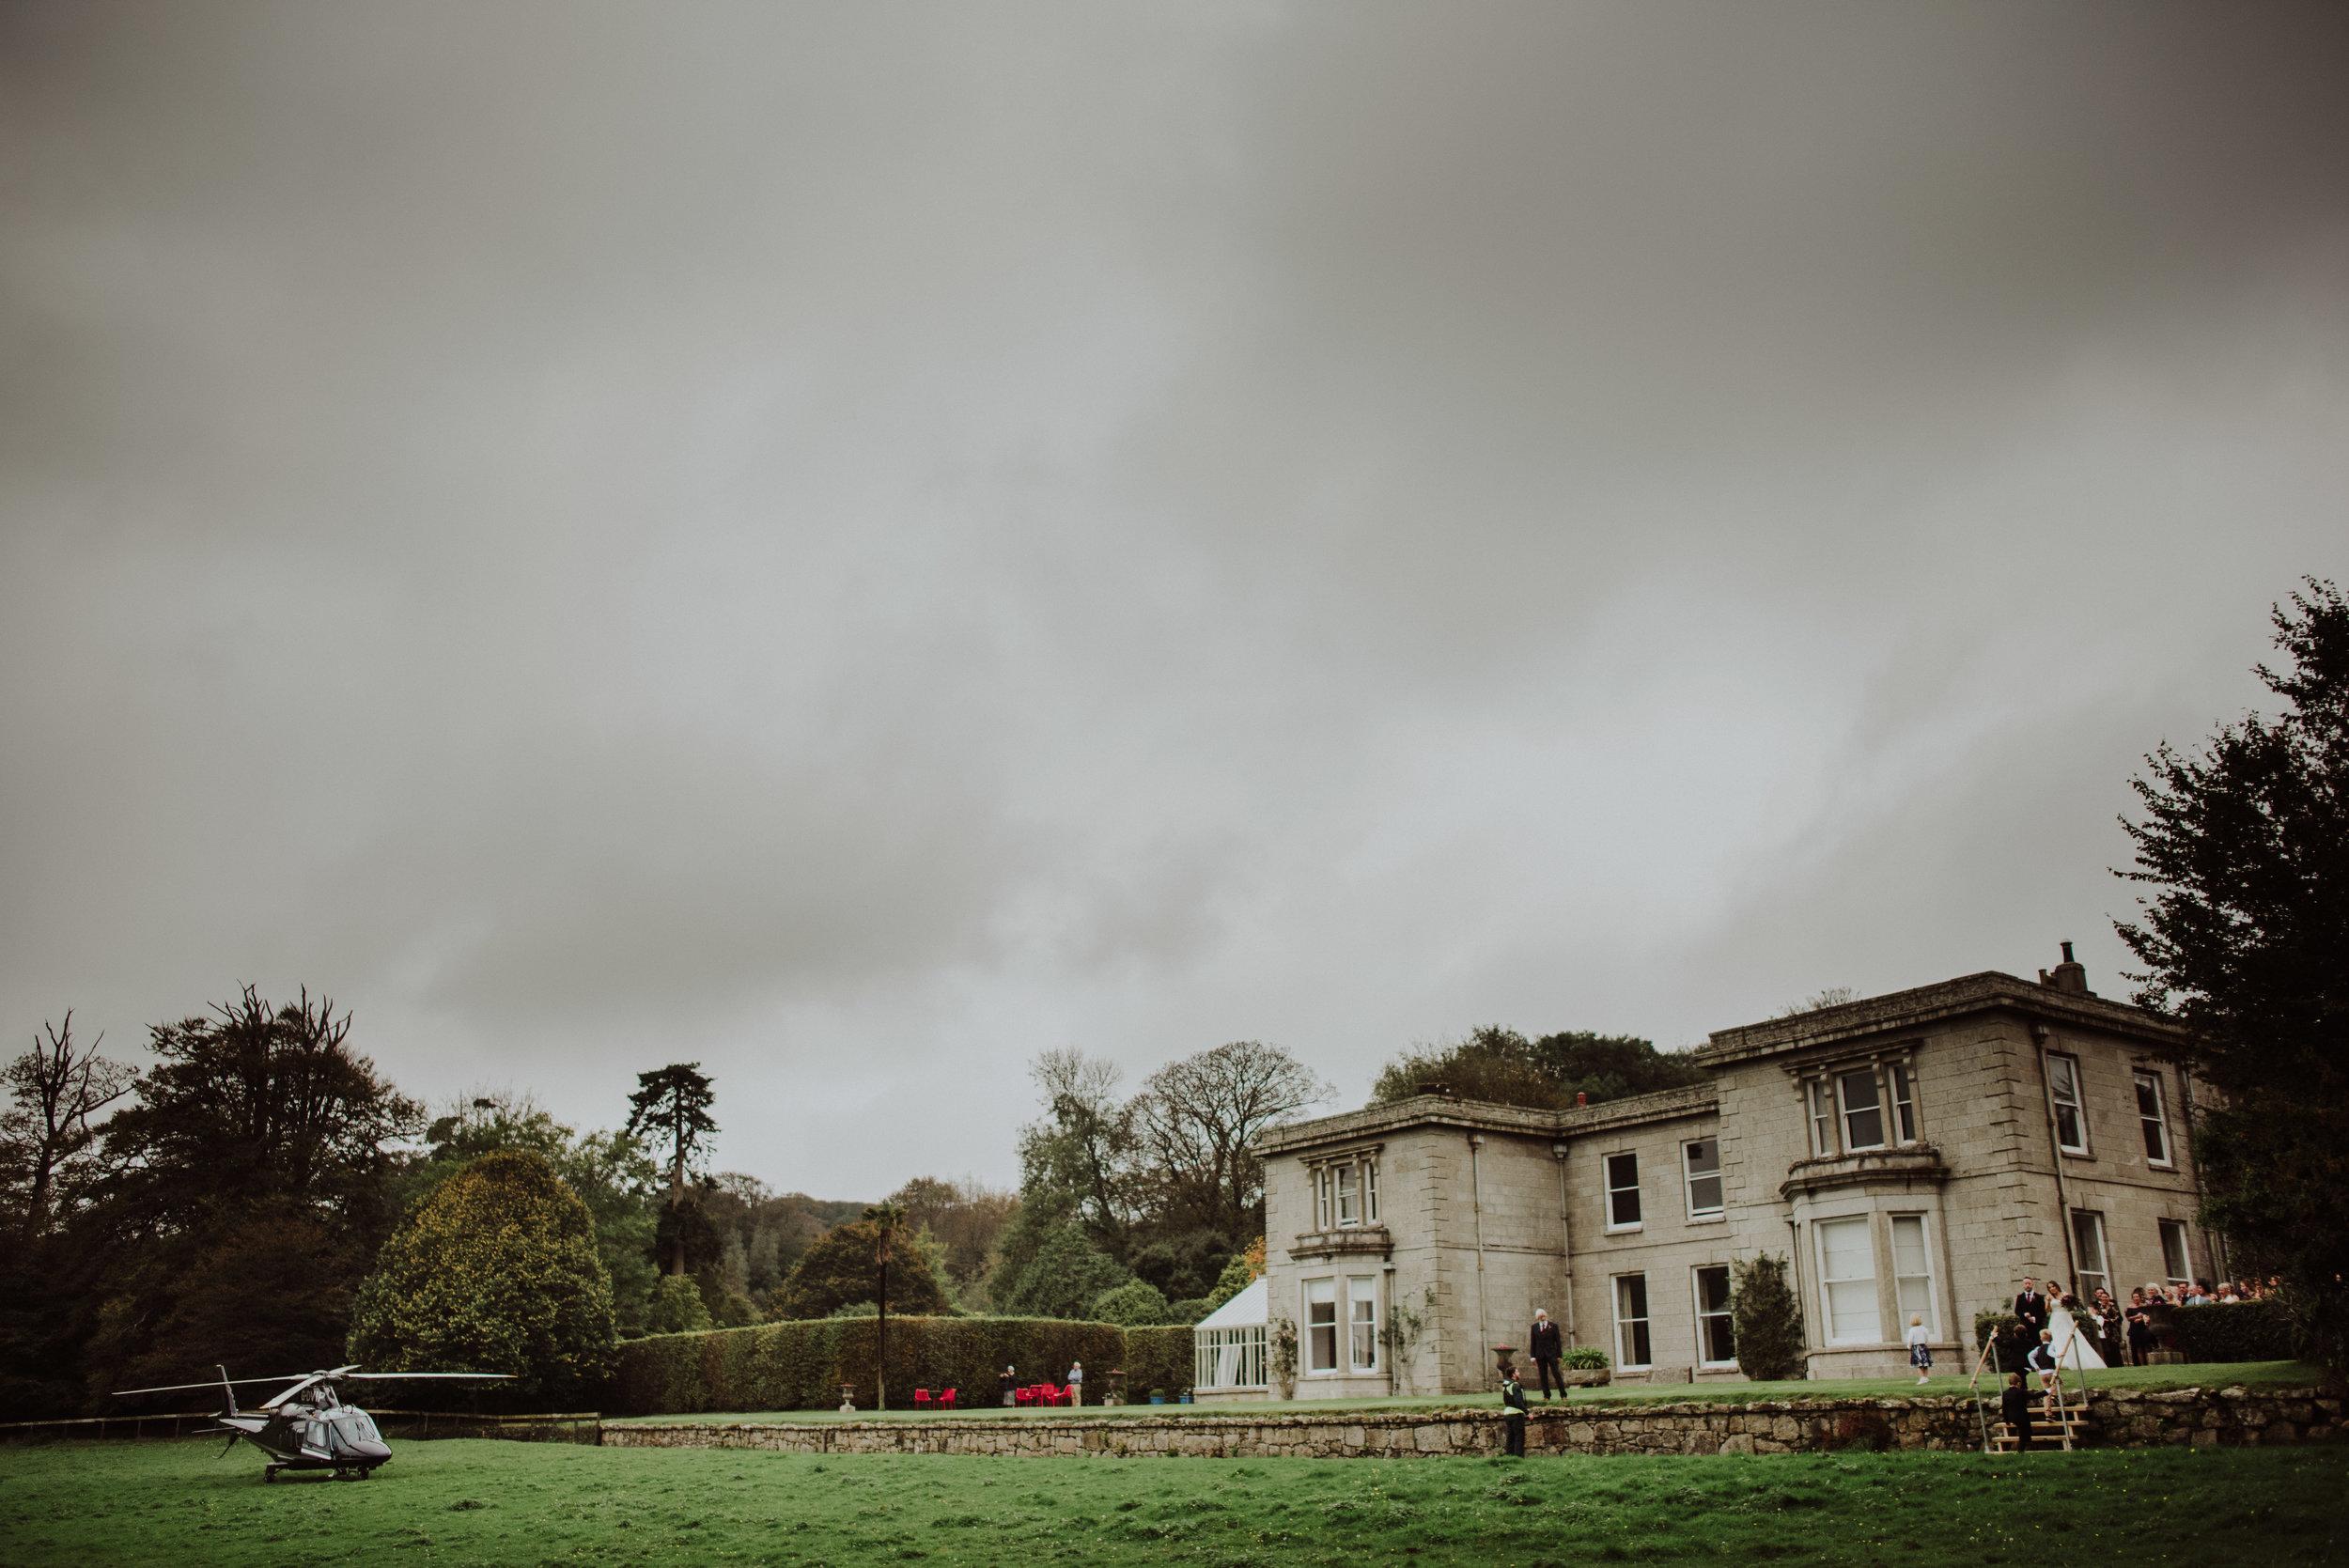 scorrier-house-cornwall-wedding-photographer-11.jpg